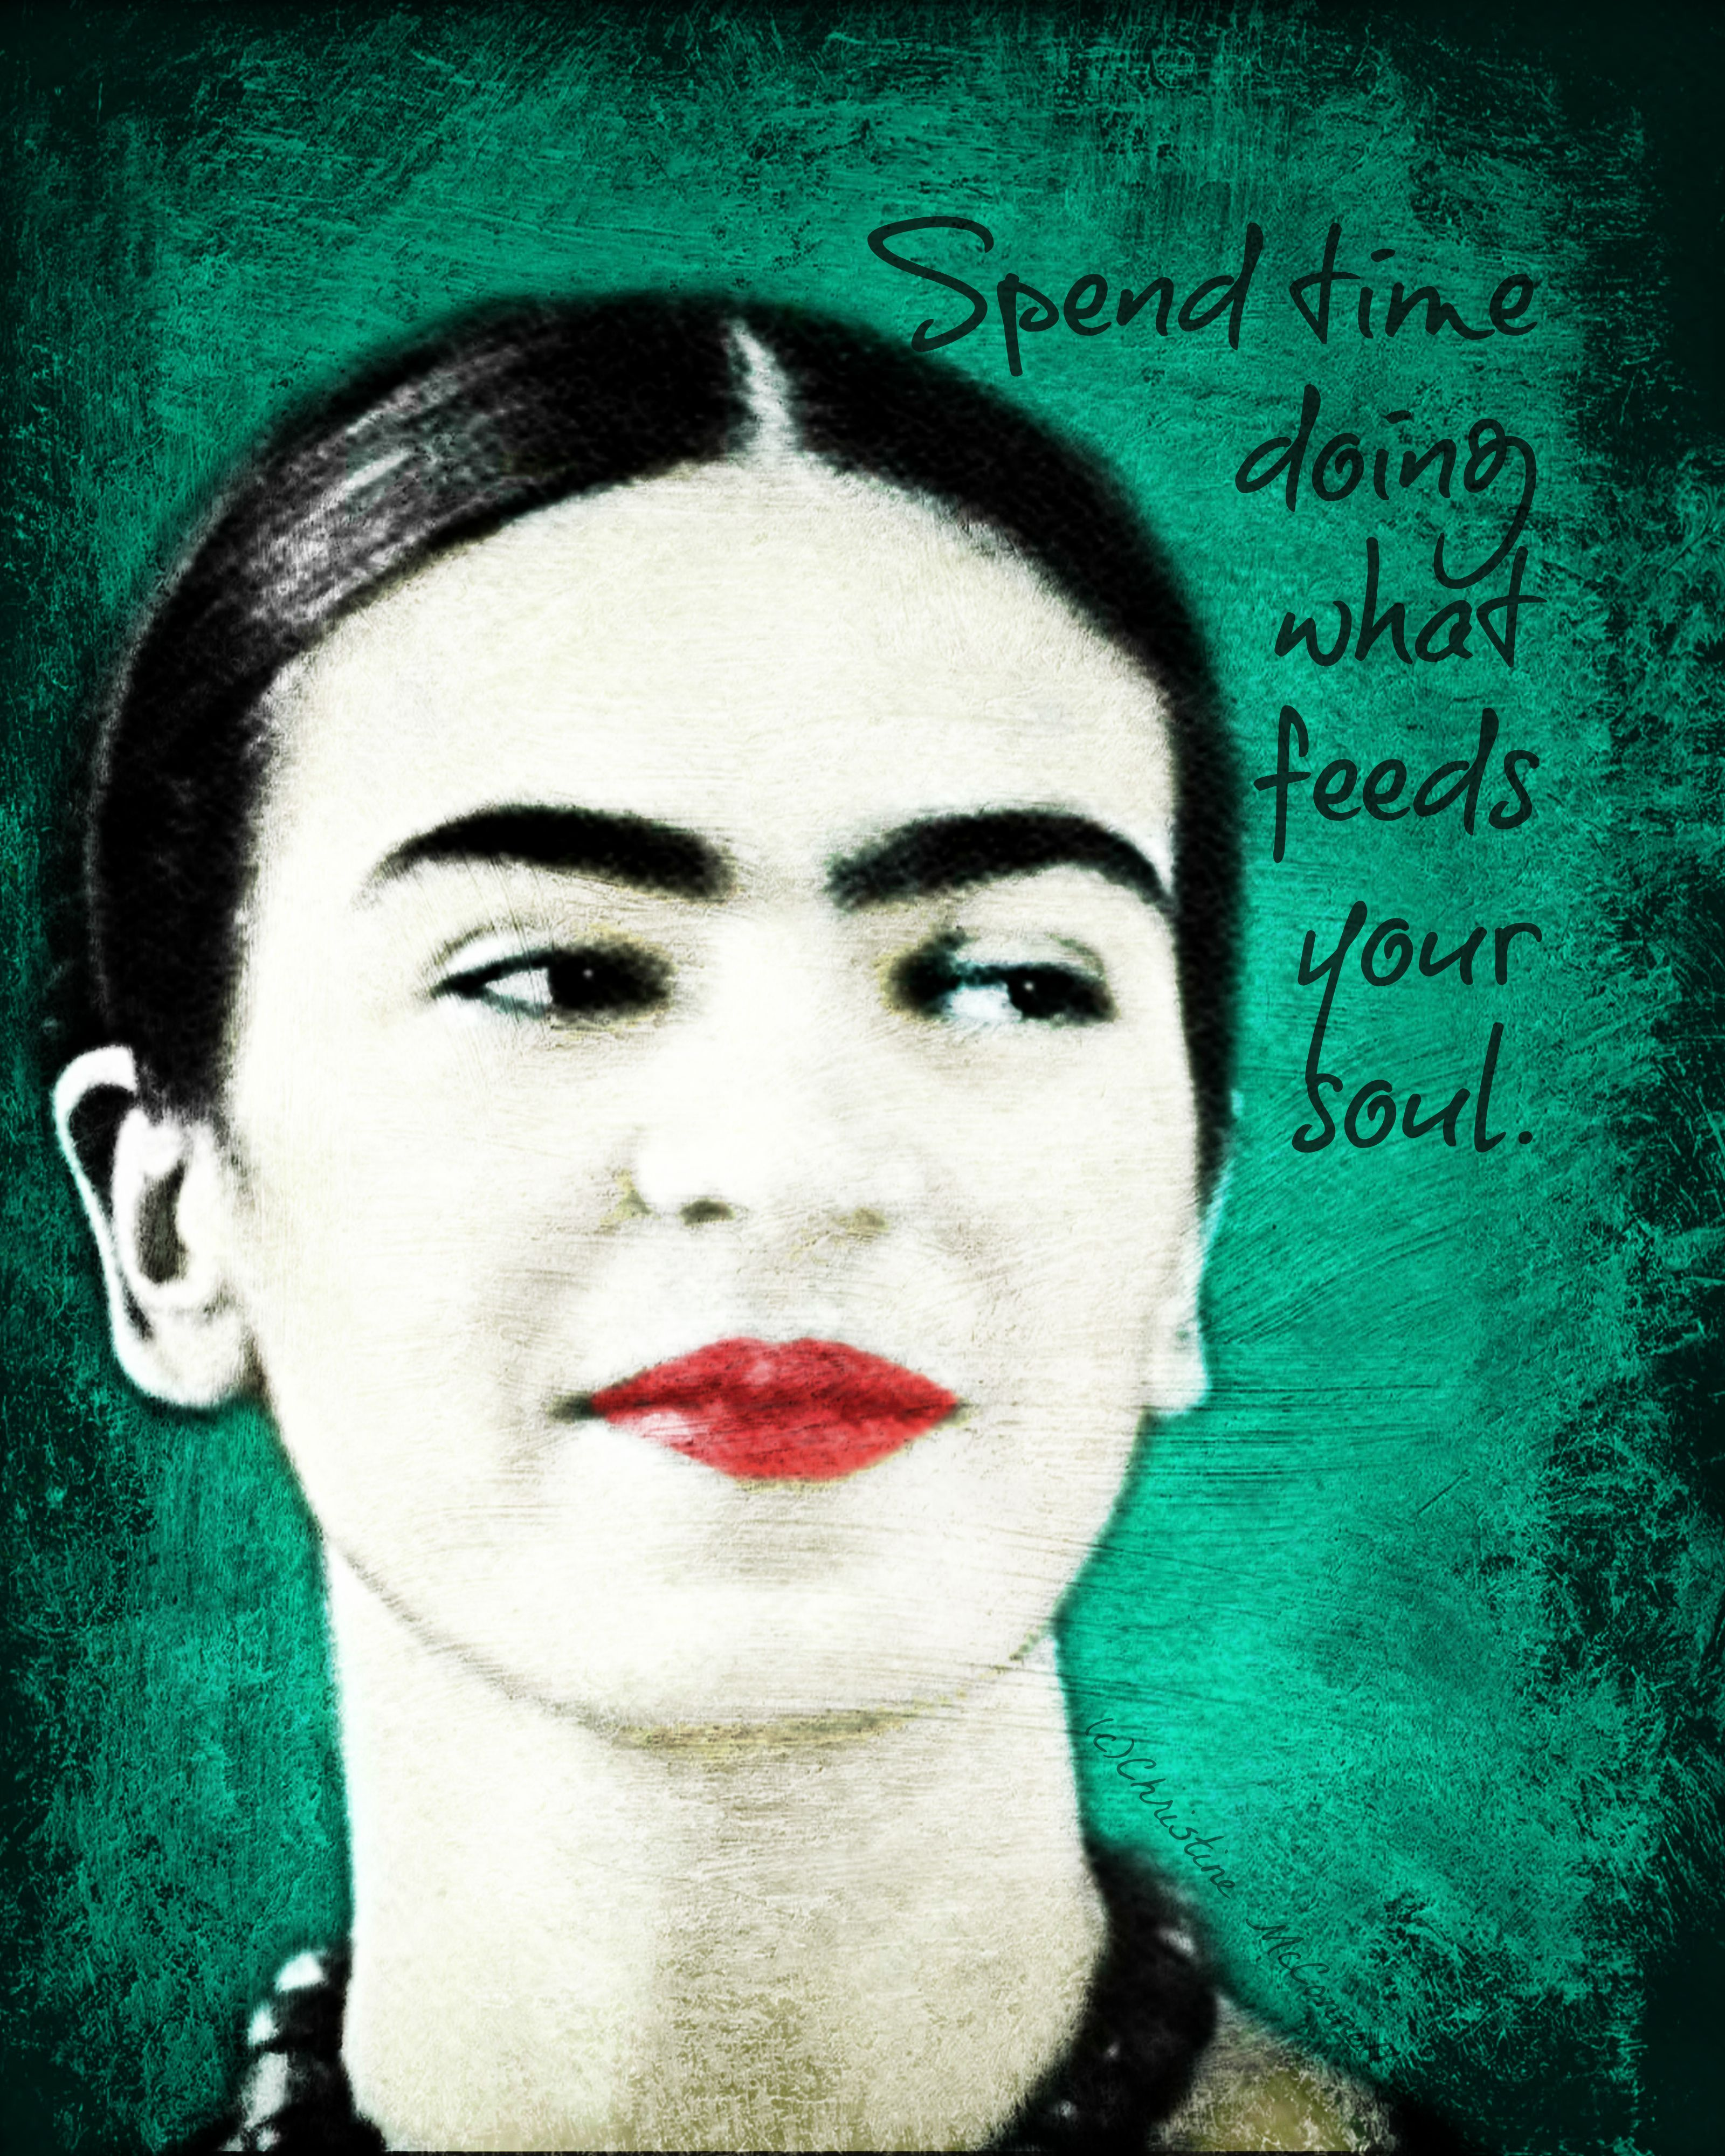 frida kahlo painting effect inspirational print available at art. Black Bedroom Furniture Sets. Home Design Ideas